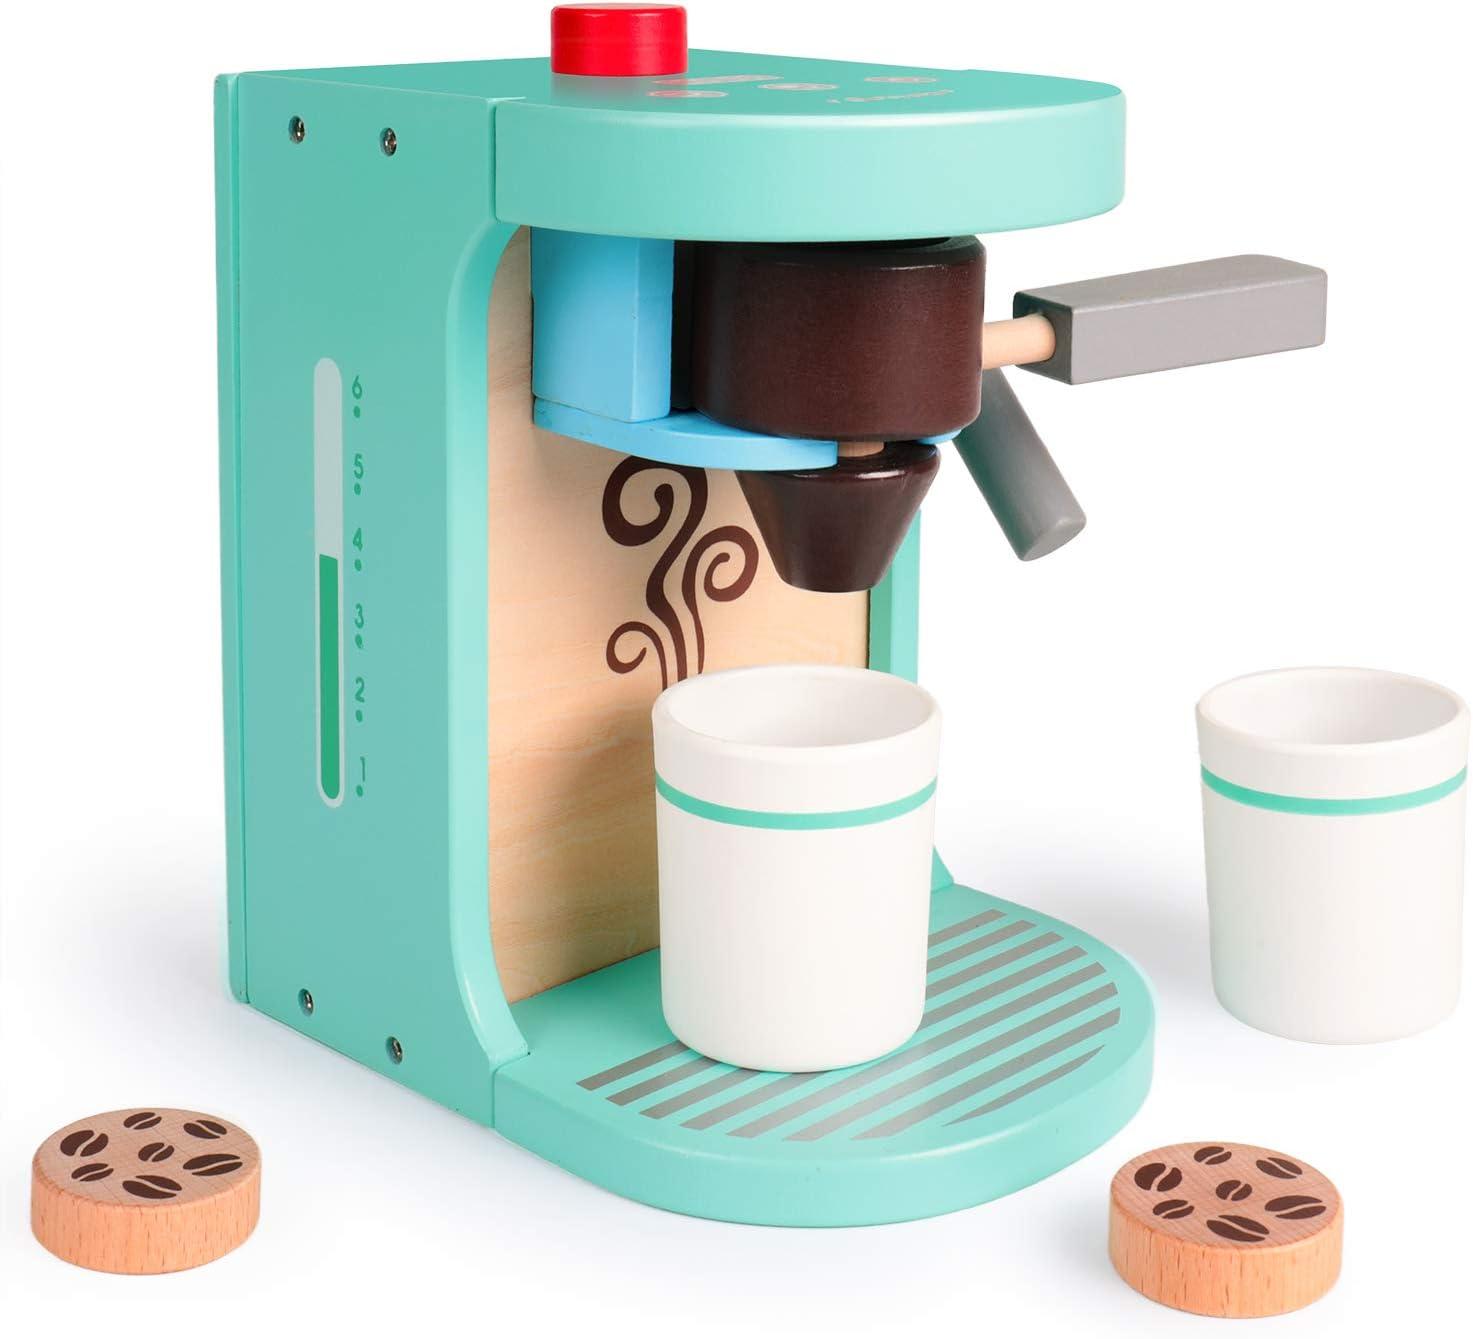 Juguete para máquina de café de Madera, Juguete Educativo temprano ...